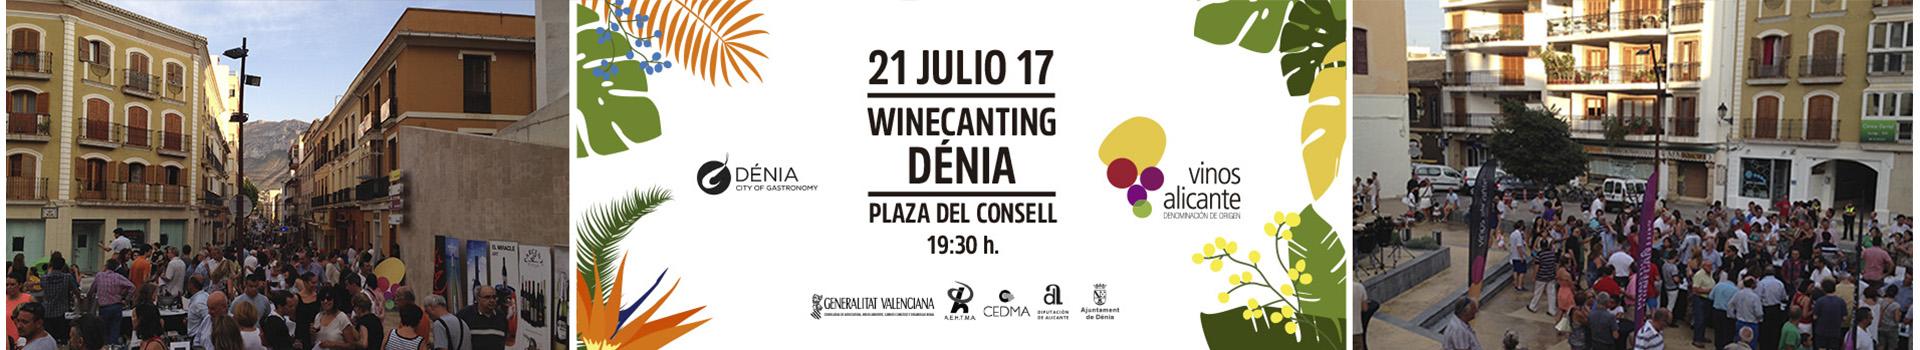 winecanting denia